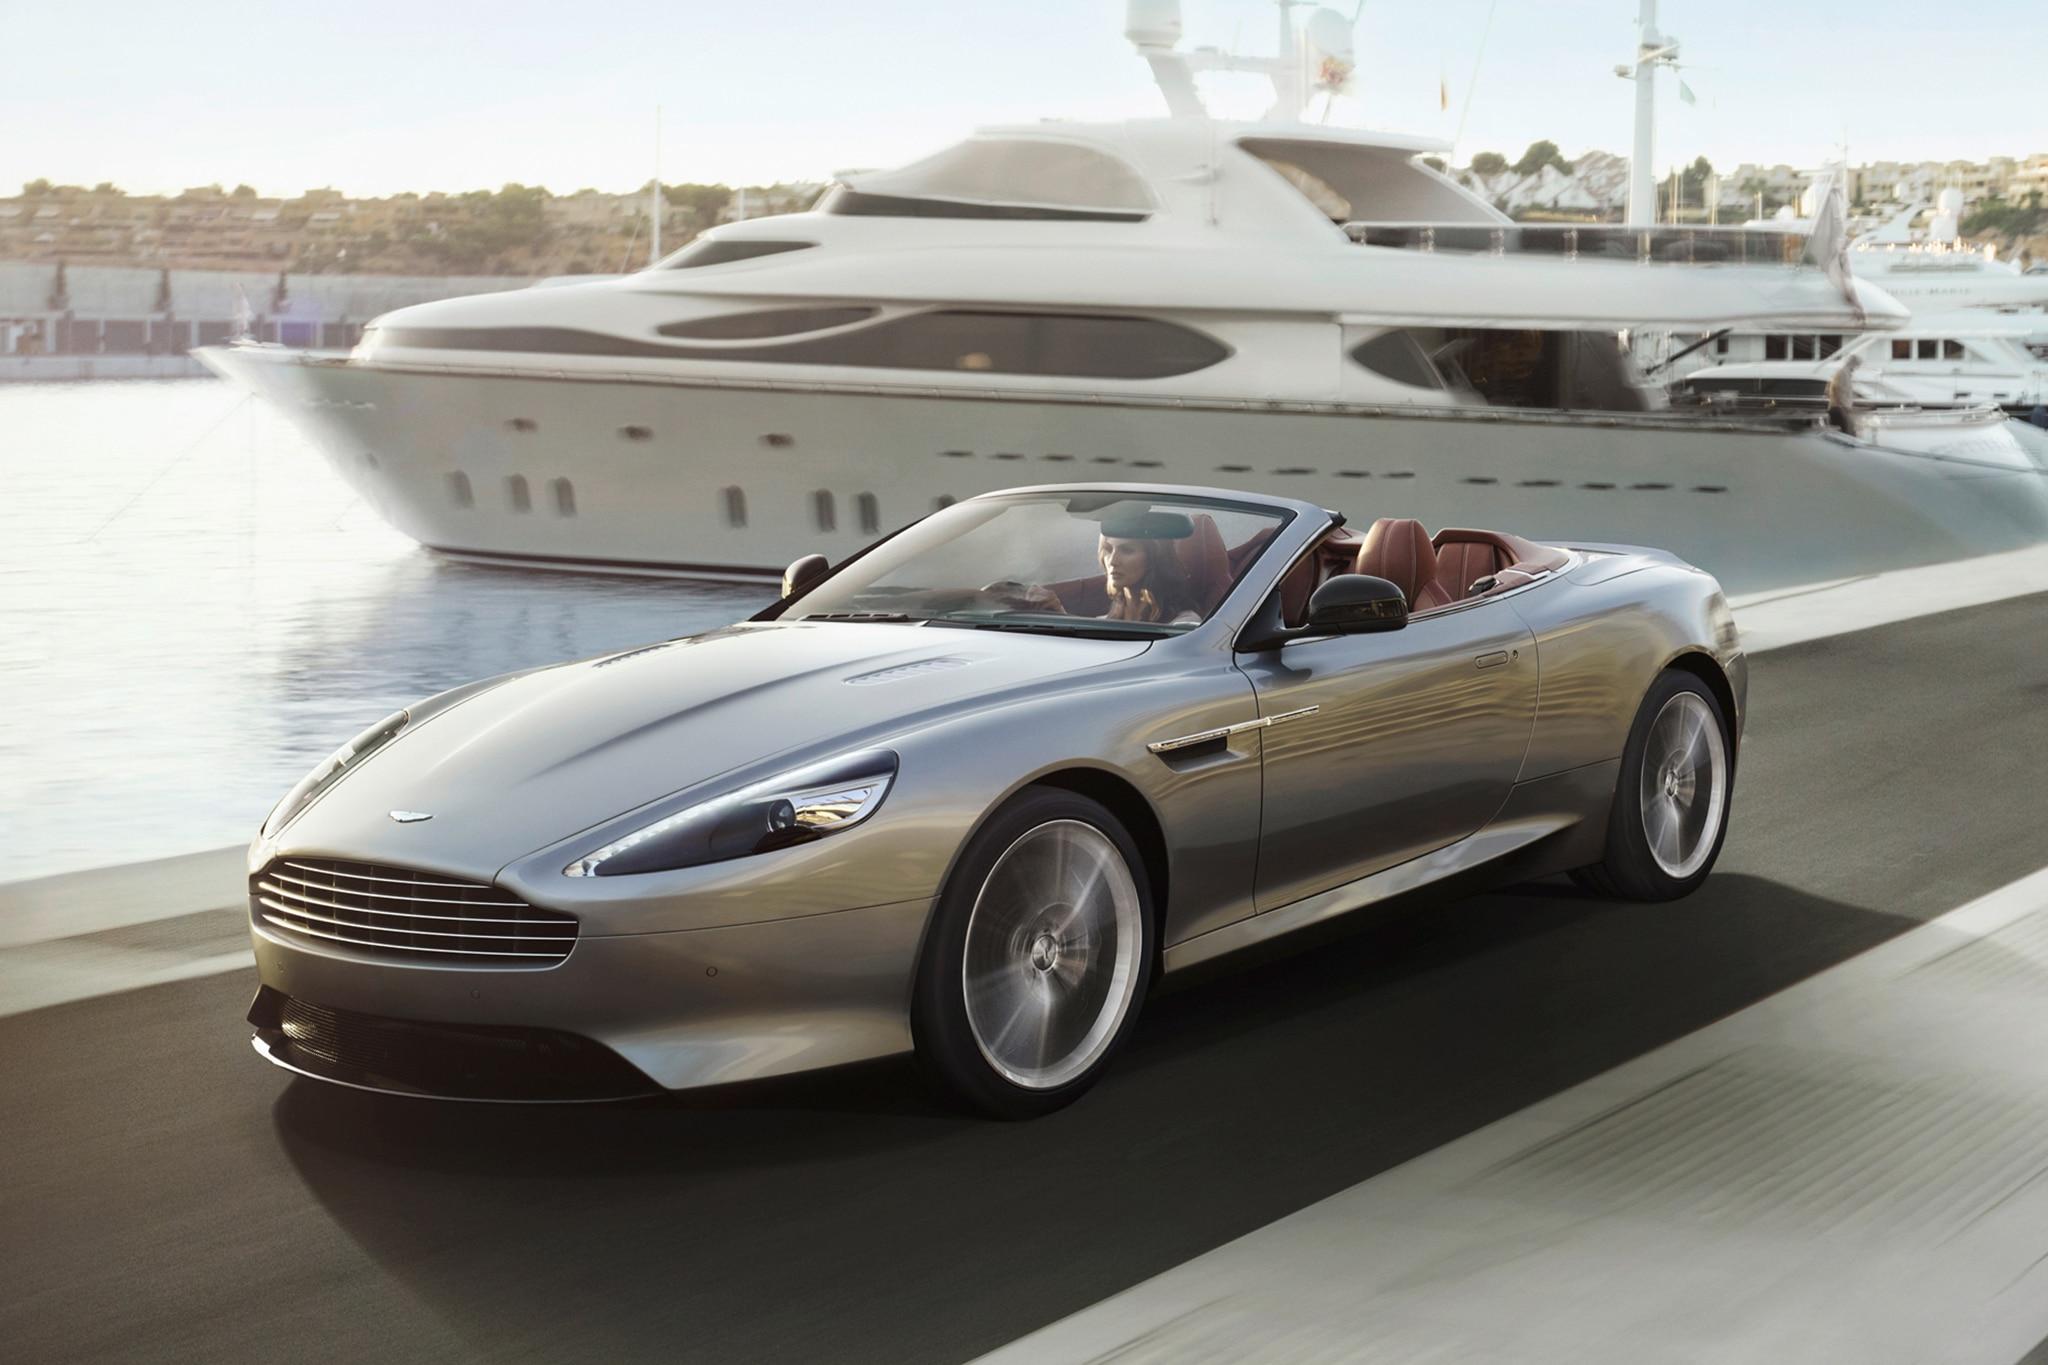 2014 Aston Martin DB9 Convertible Three Quarters View 11